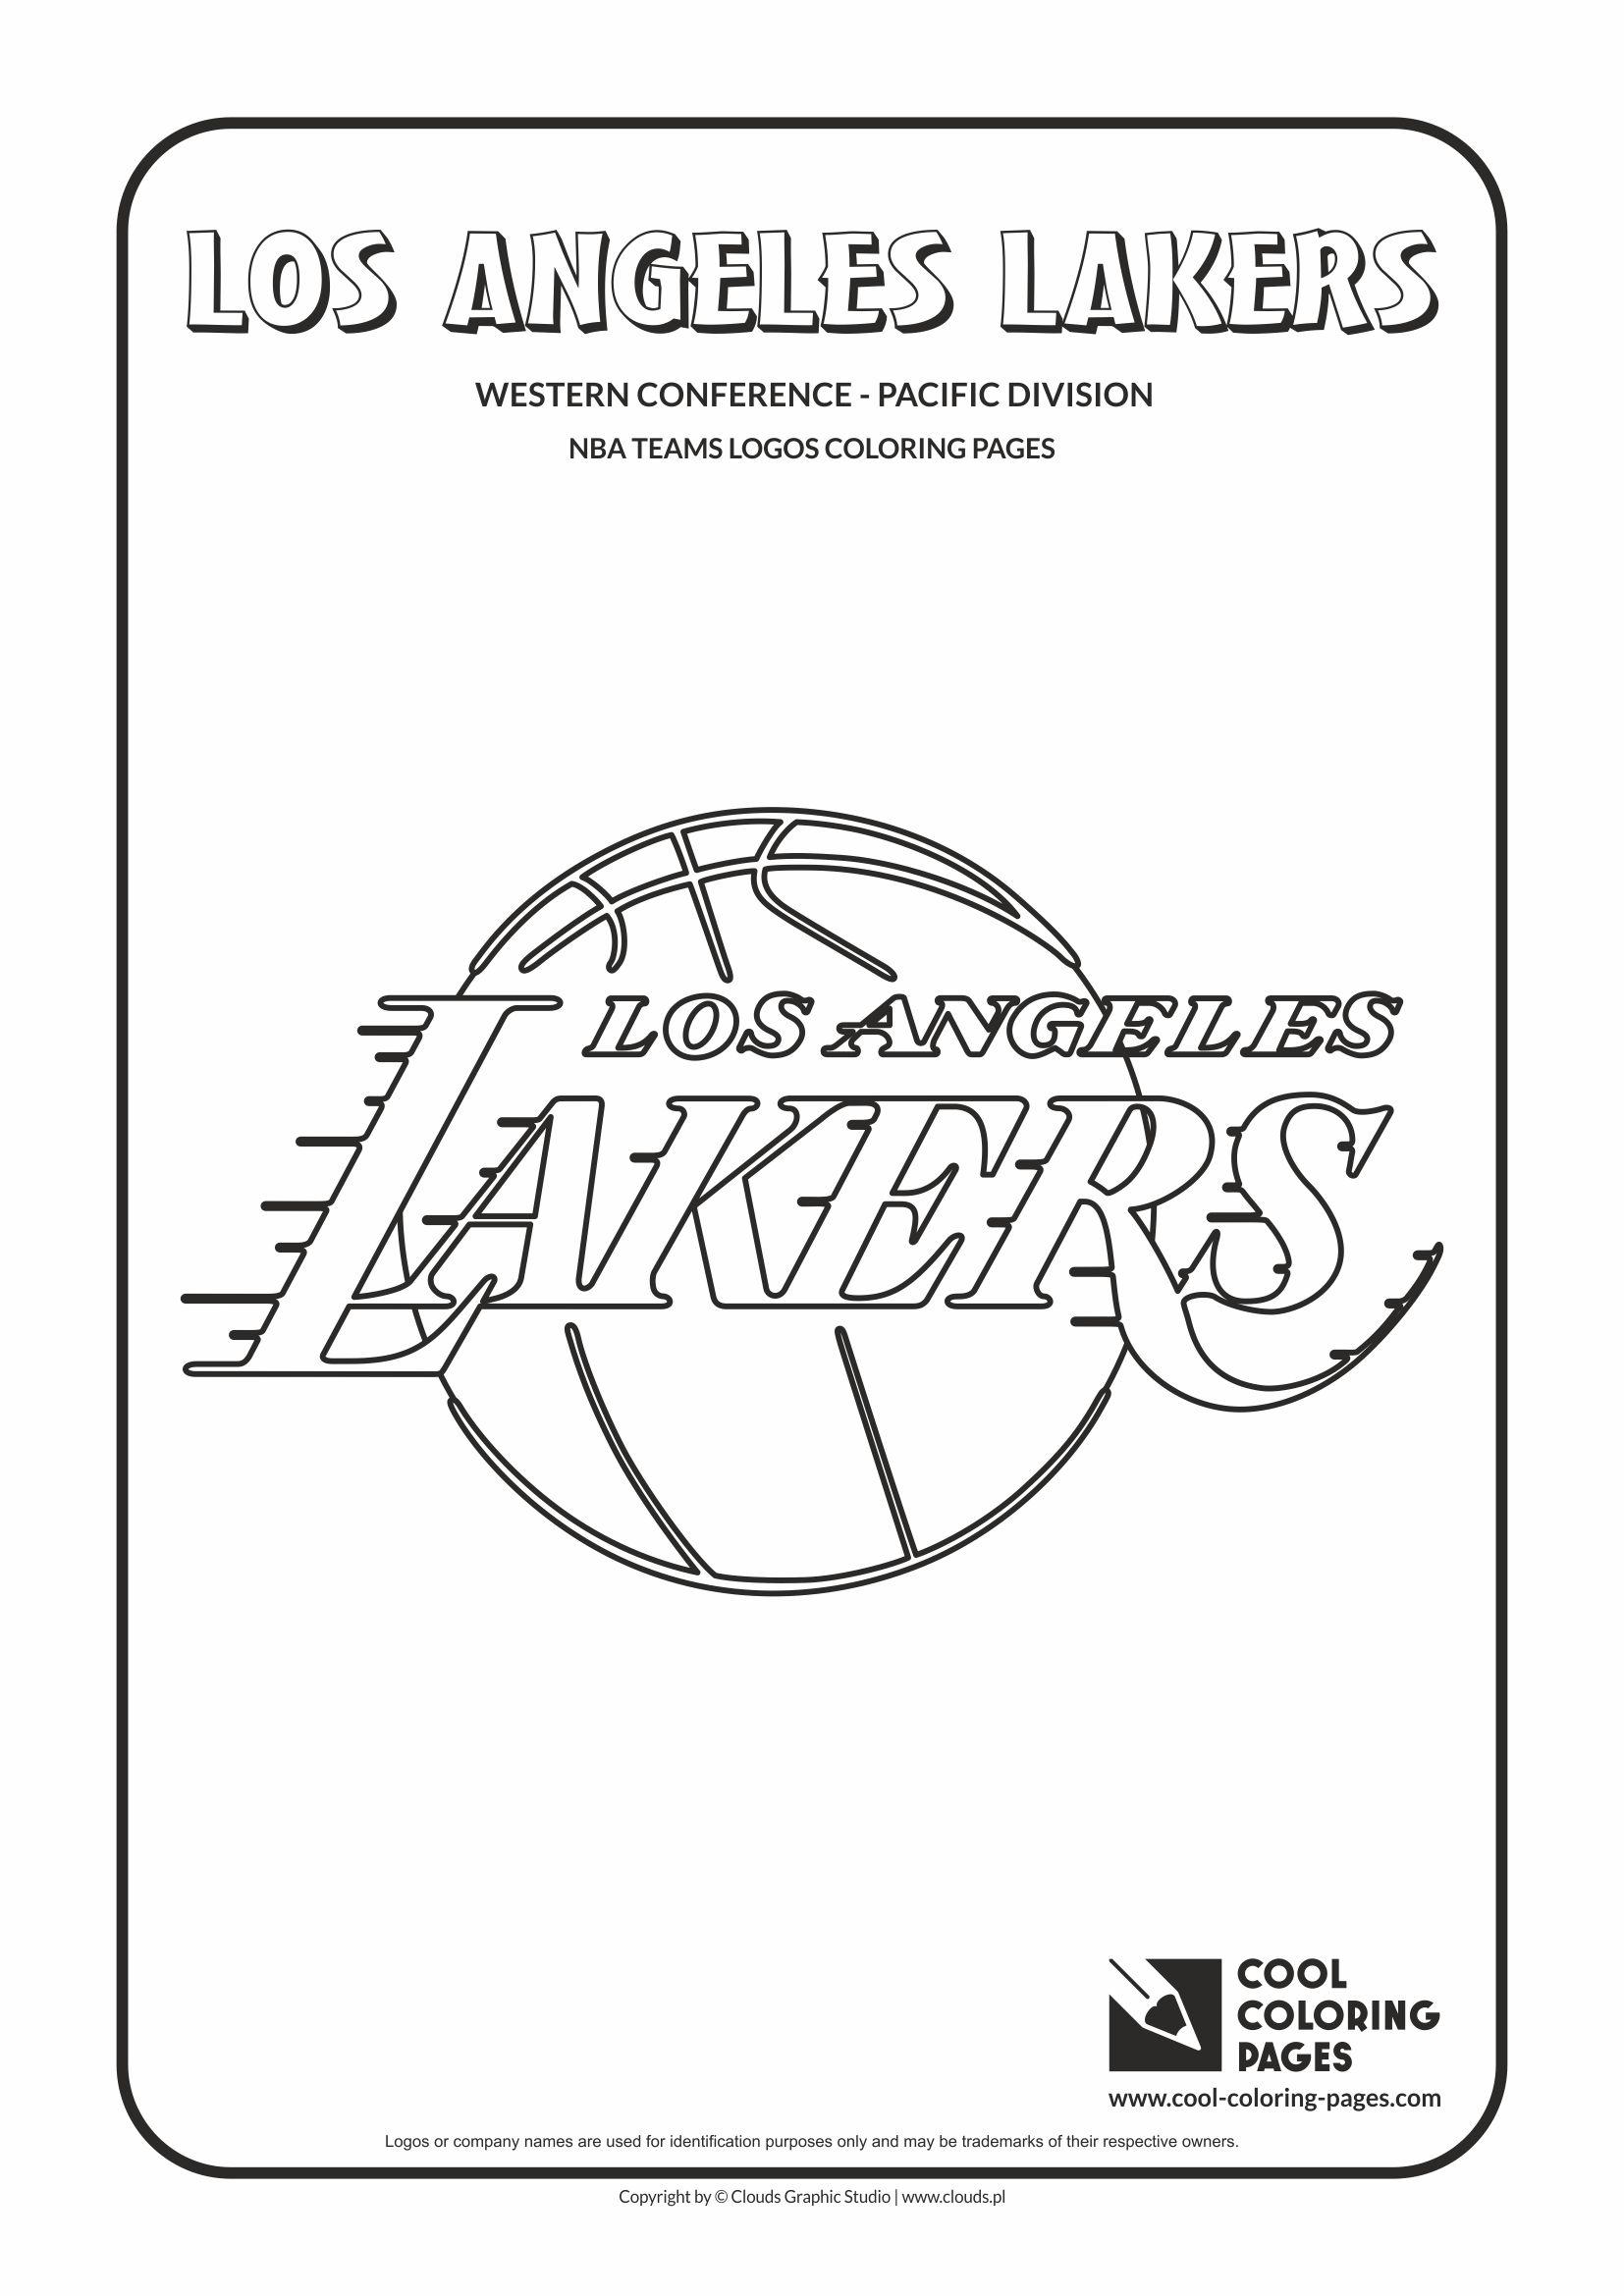 Gambar Los Angeles Lakers Nba Coloring Pages Basketball Di Rebanas